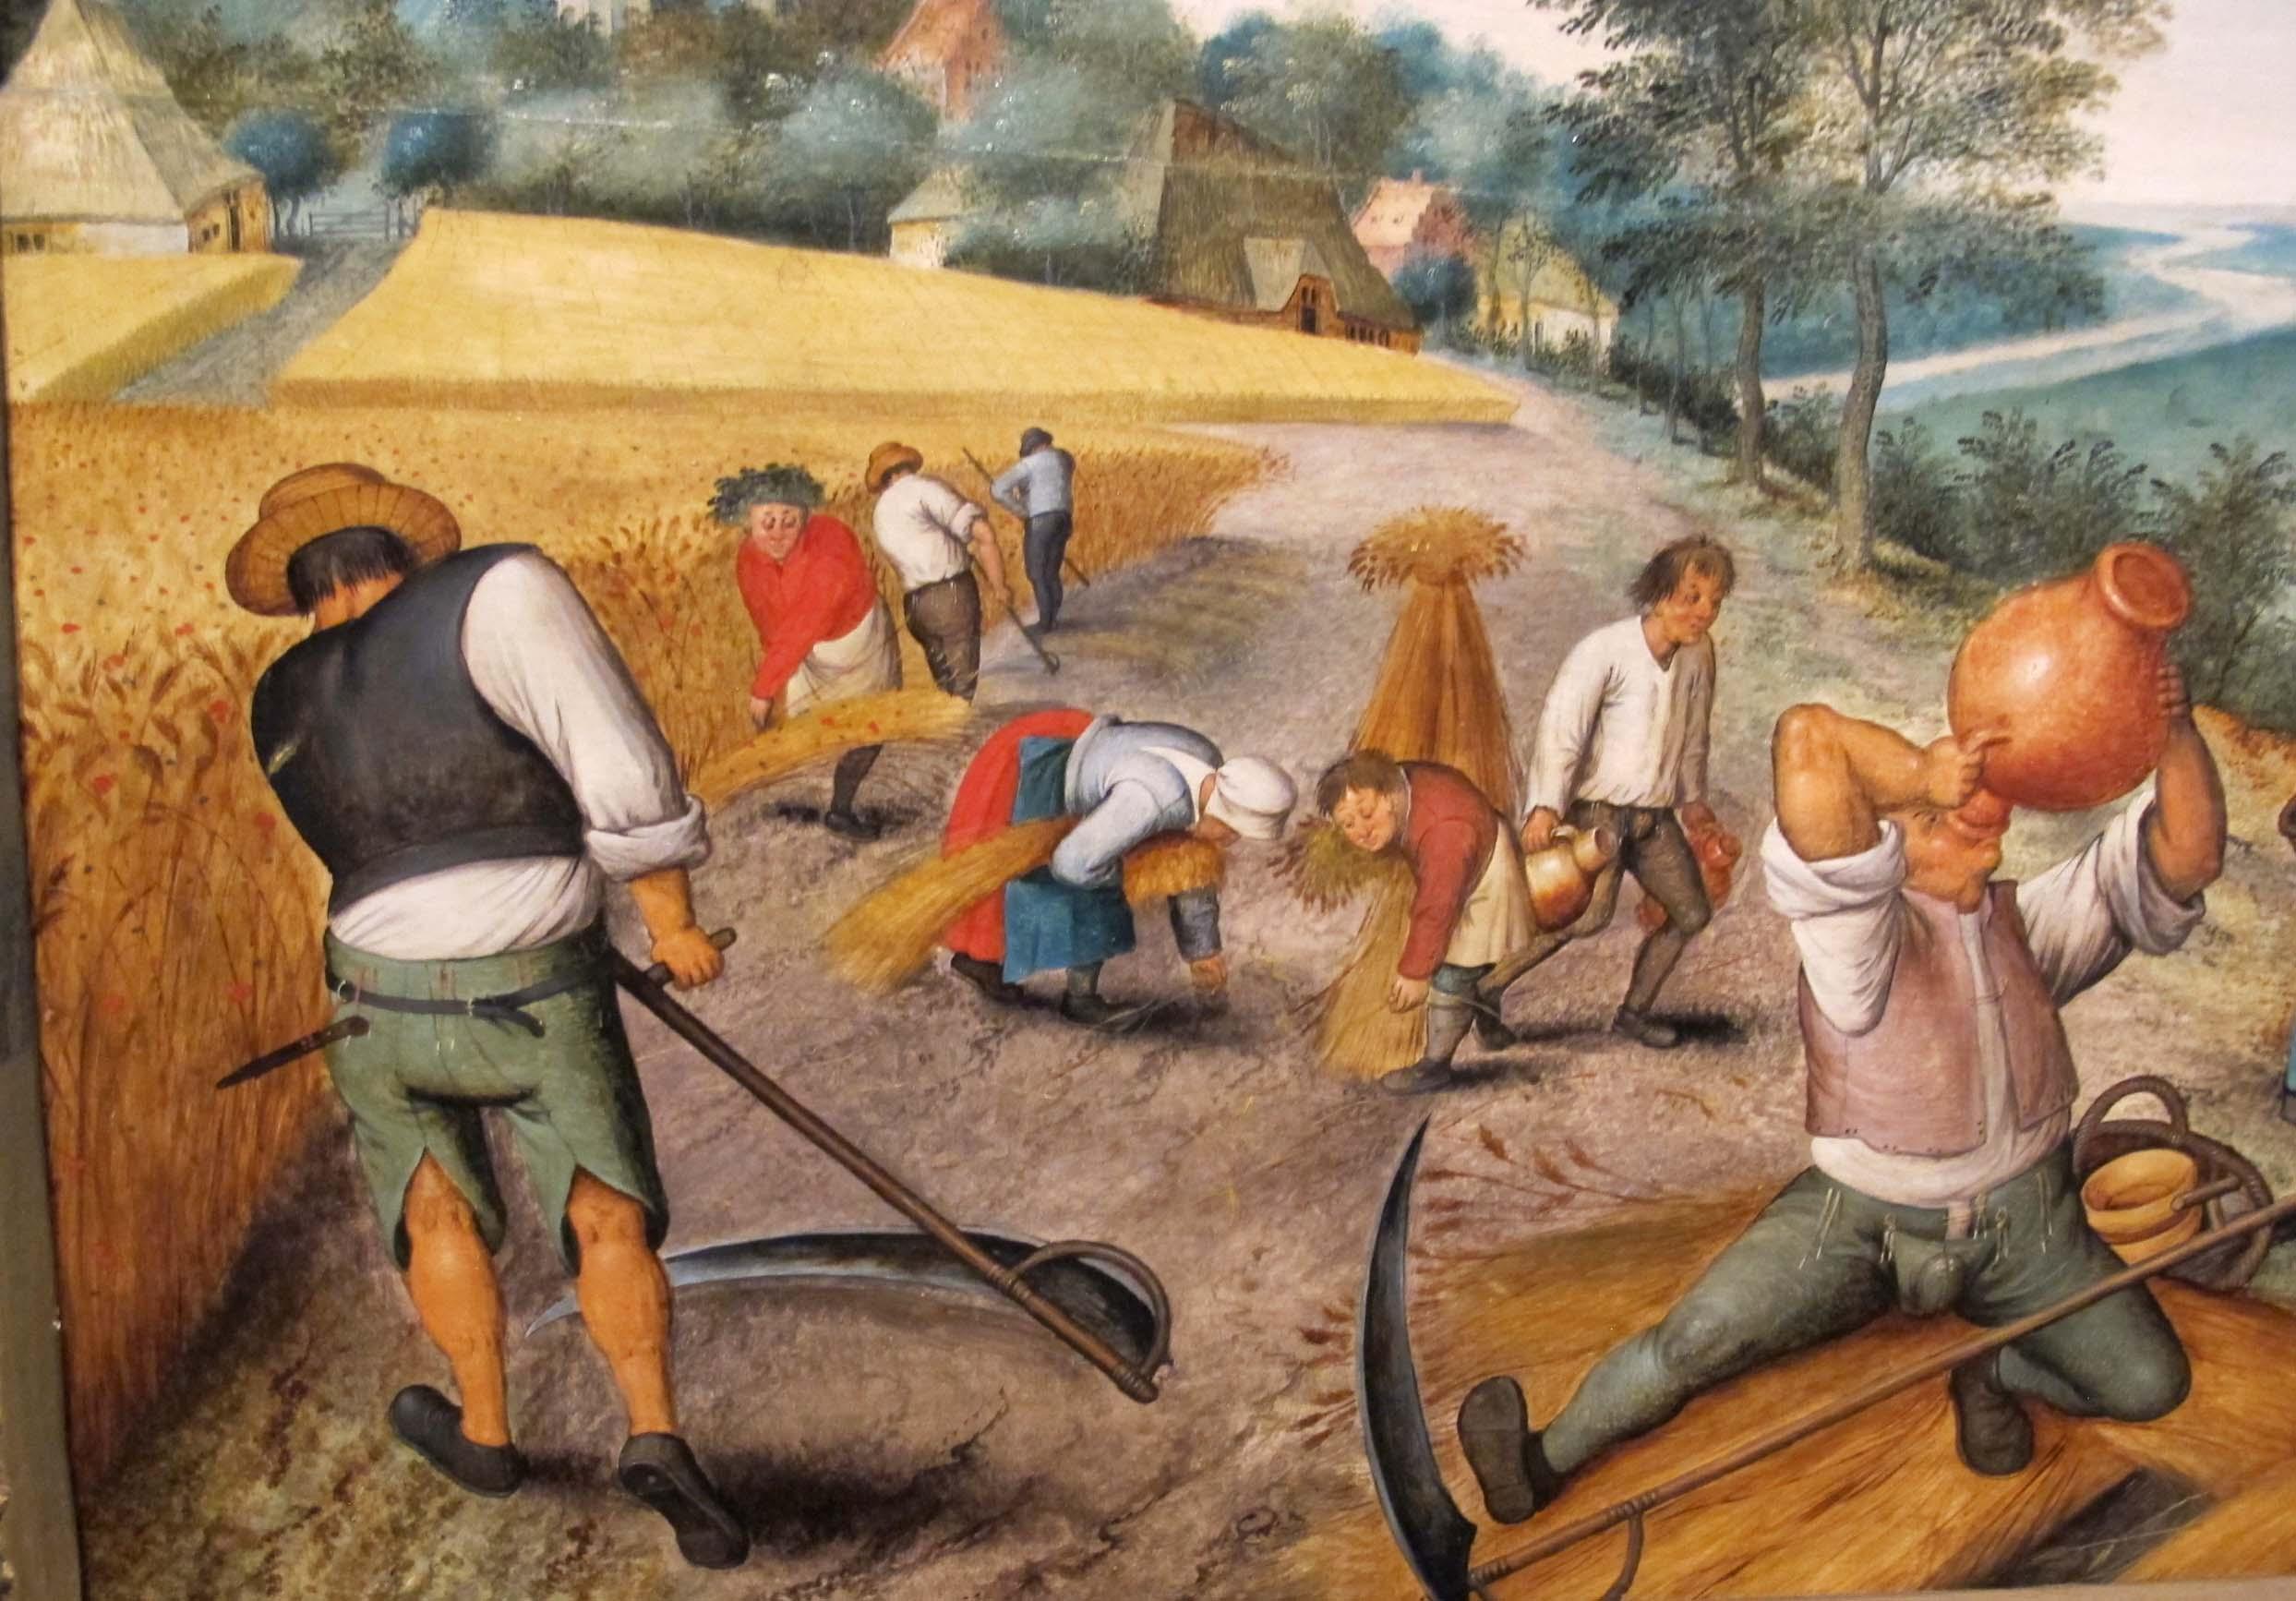 Peasants harvesting crops, by Flemish artist Pieter Brueghel, 17th century